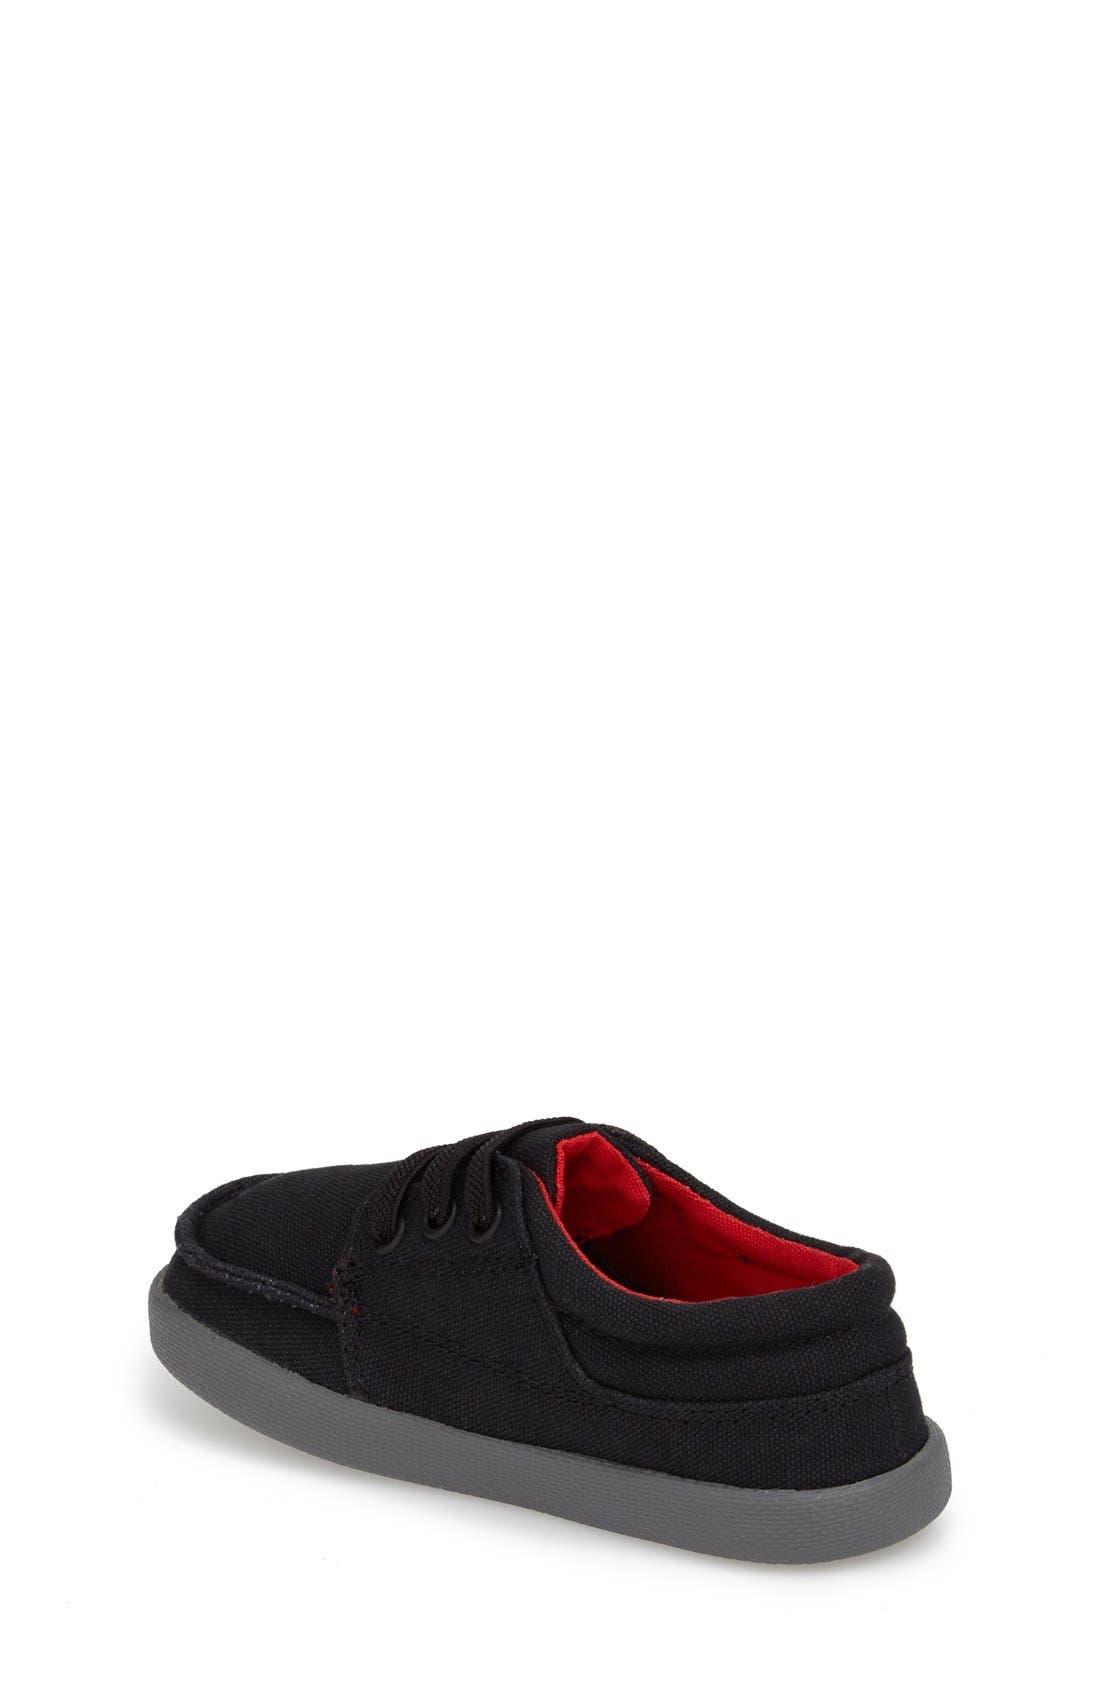 'Lil Tko' Sneaker,                             Alternate thumbnail 2, color,                             Black